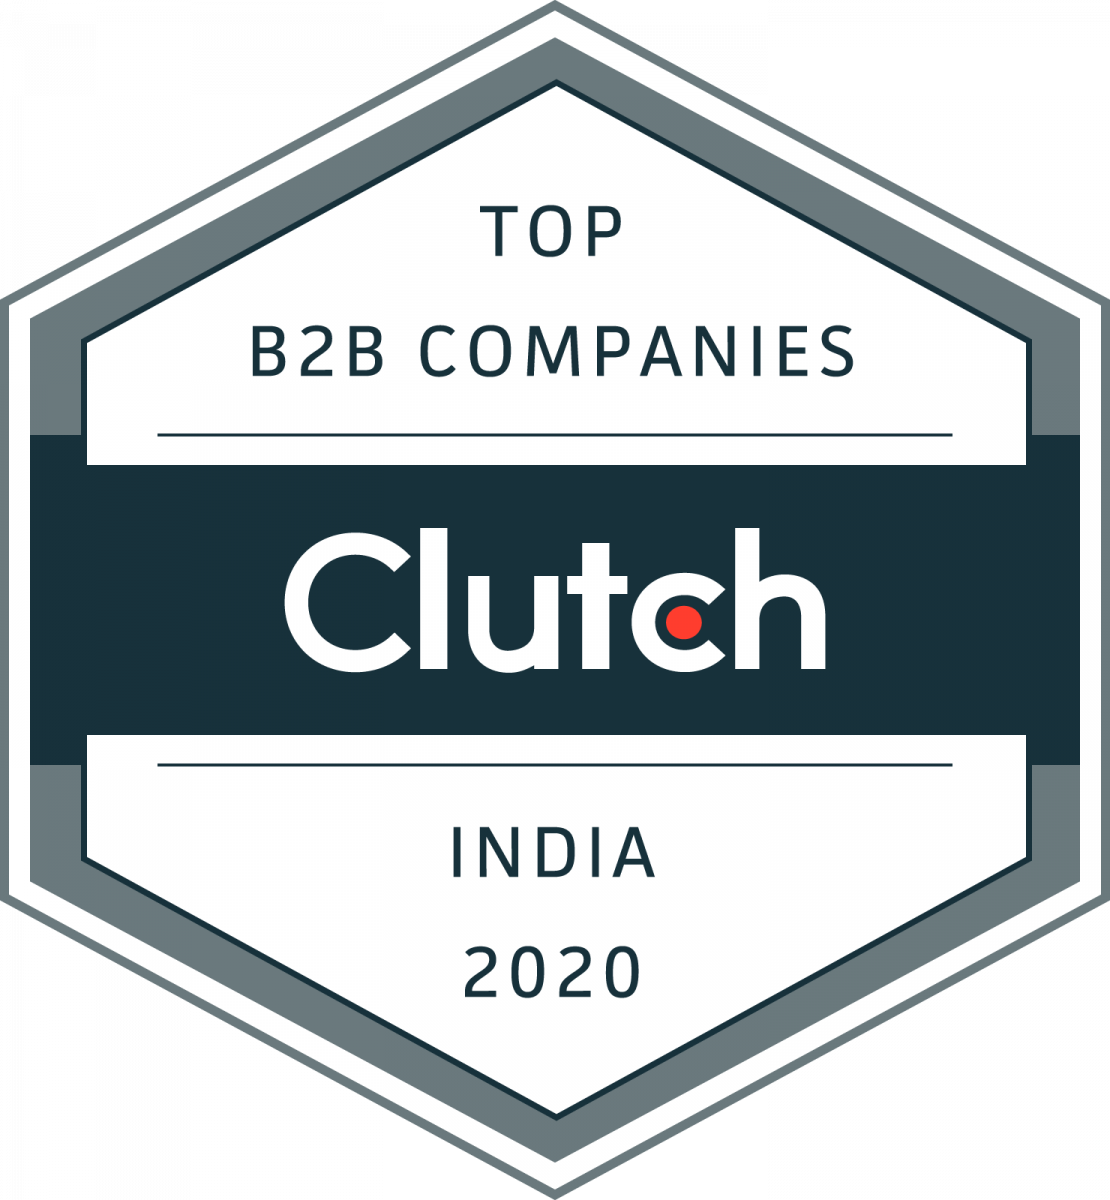 Top B2B Companies India